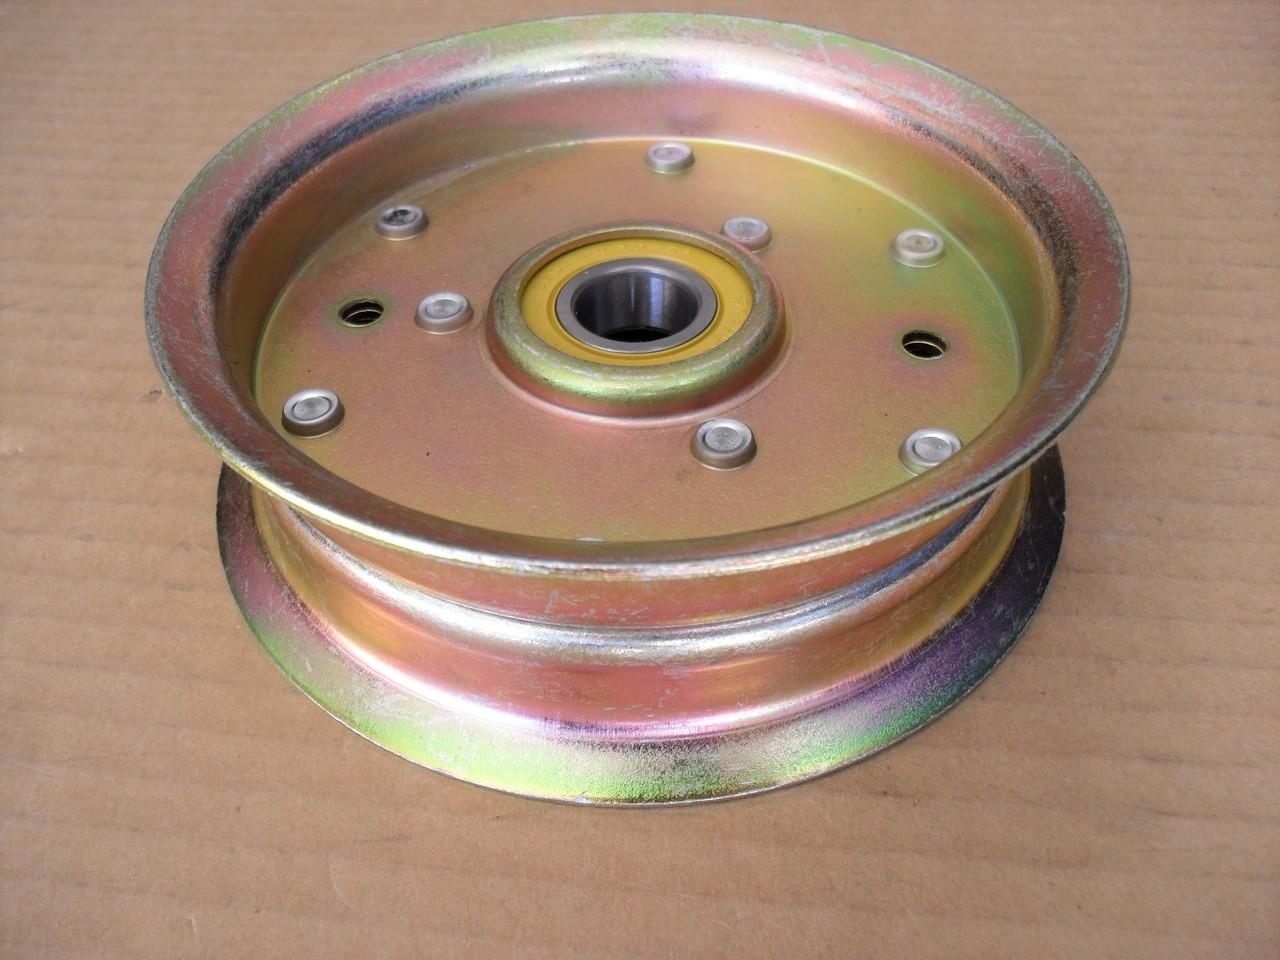 New Idler Pulley Kit W//Transmission Drive Belt For John Deere D140 D150 D160 D170